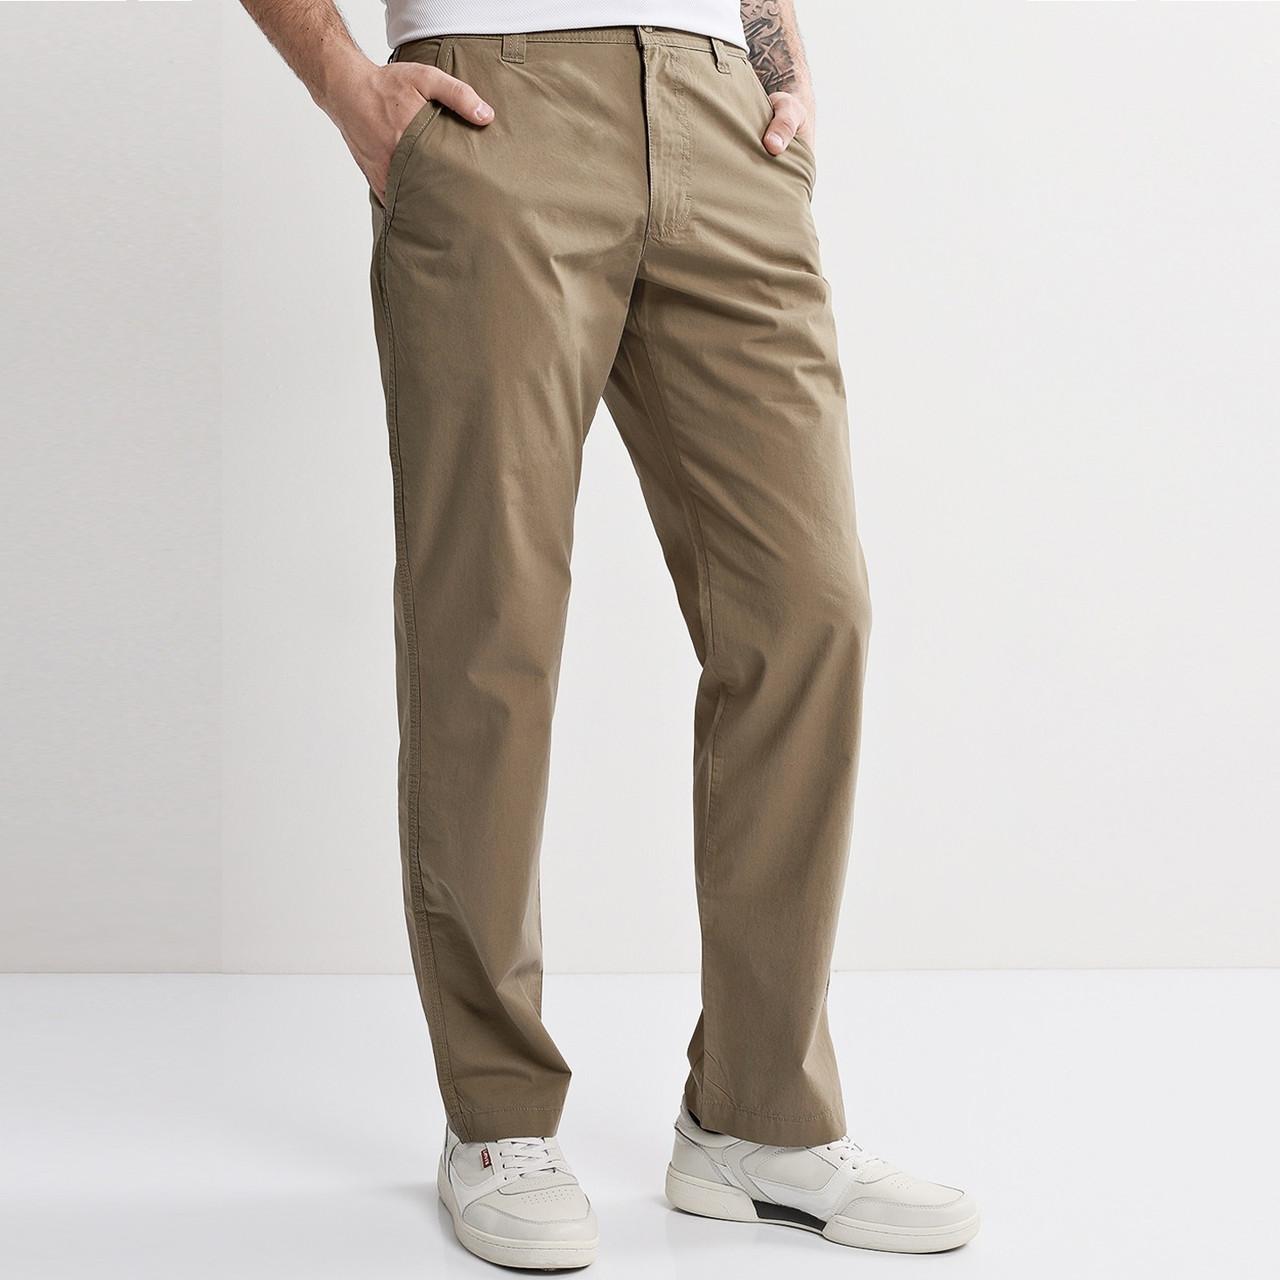 Мужские брюки Columbia Washed Out